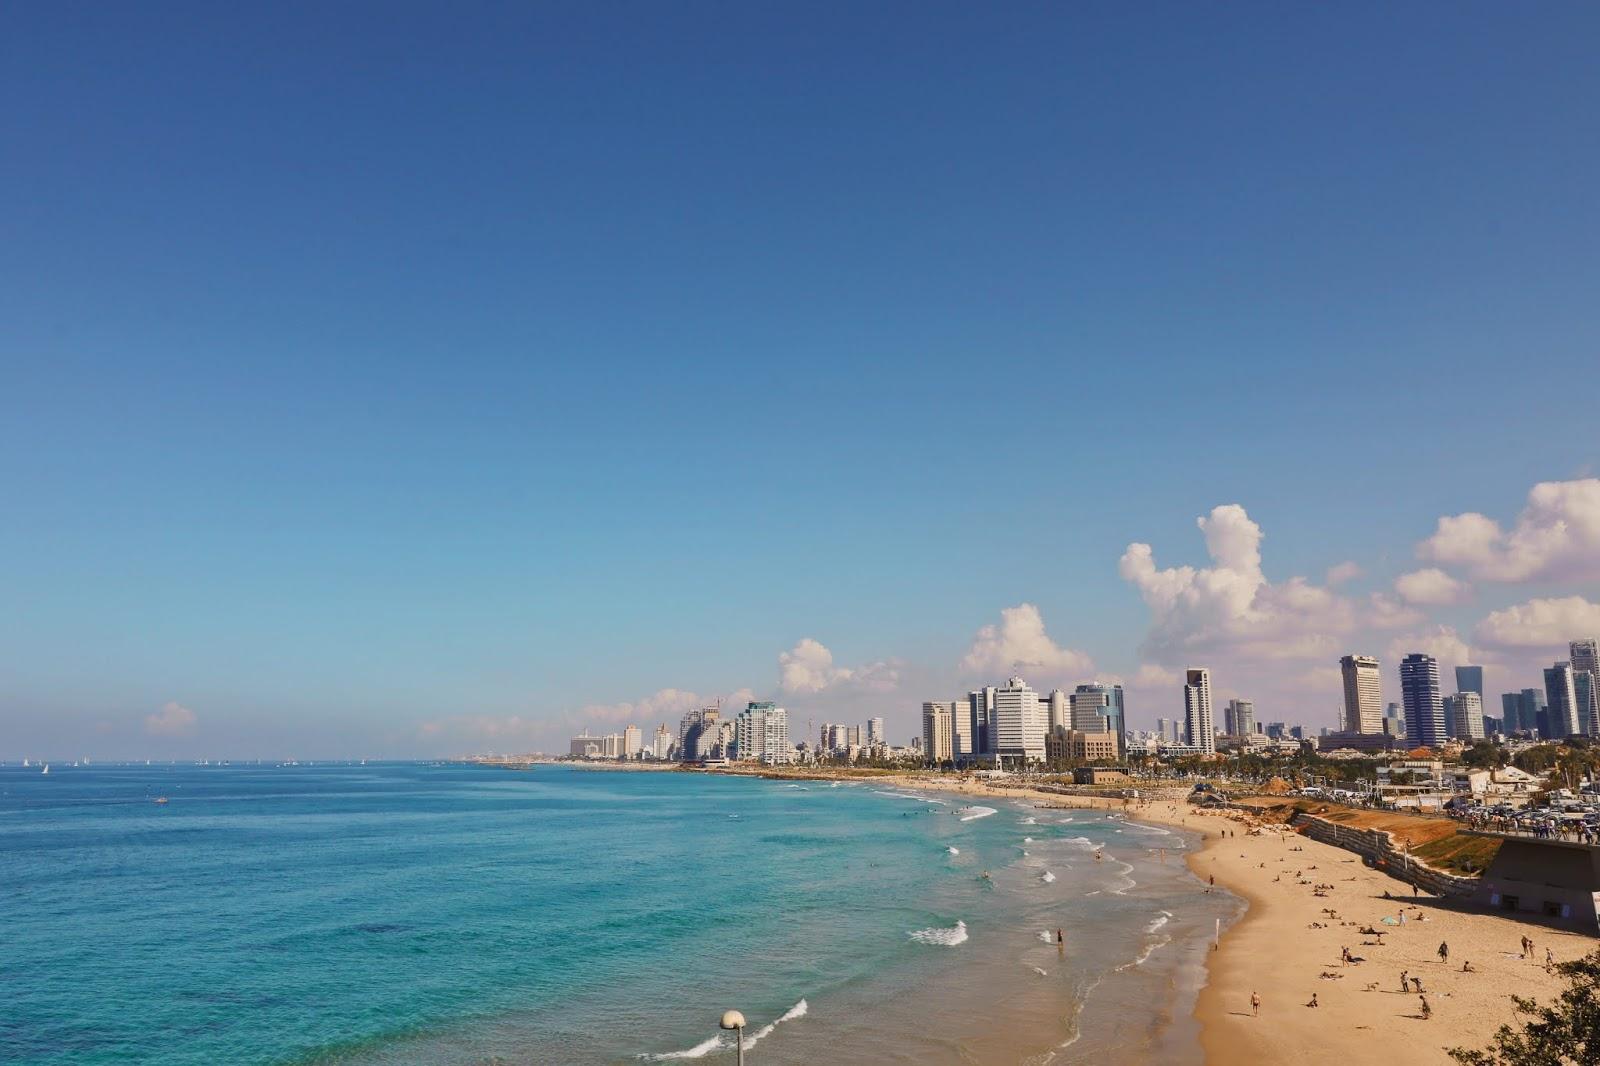 plaże tel awiwu